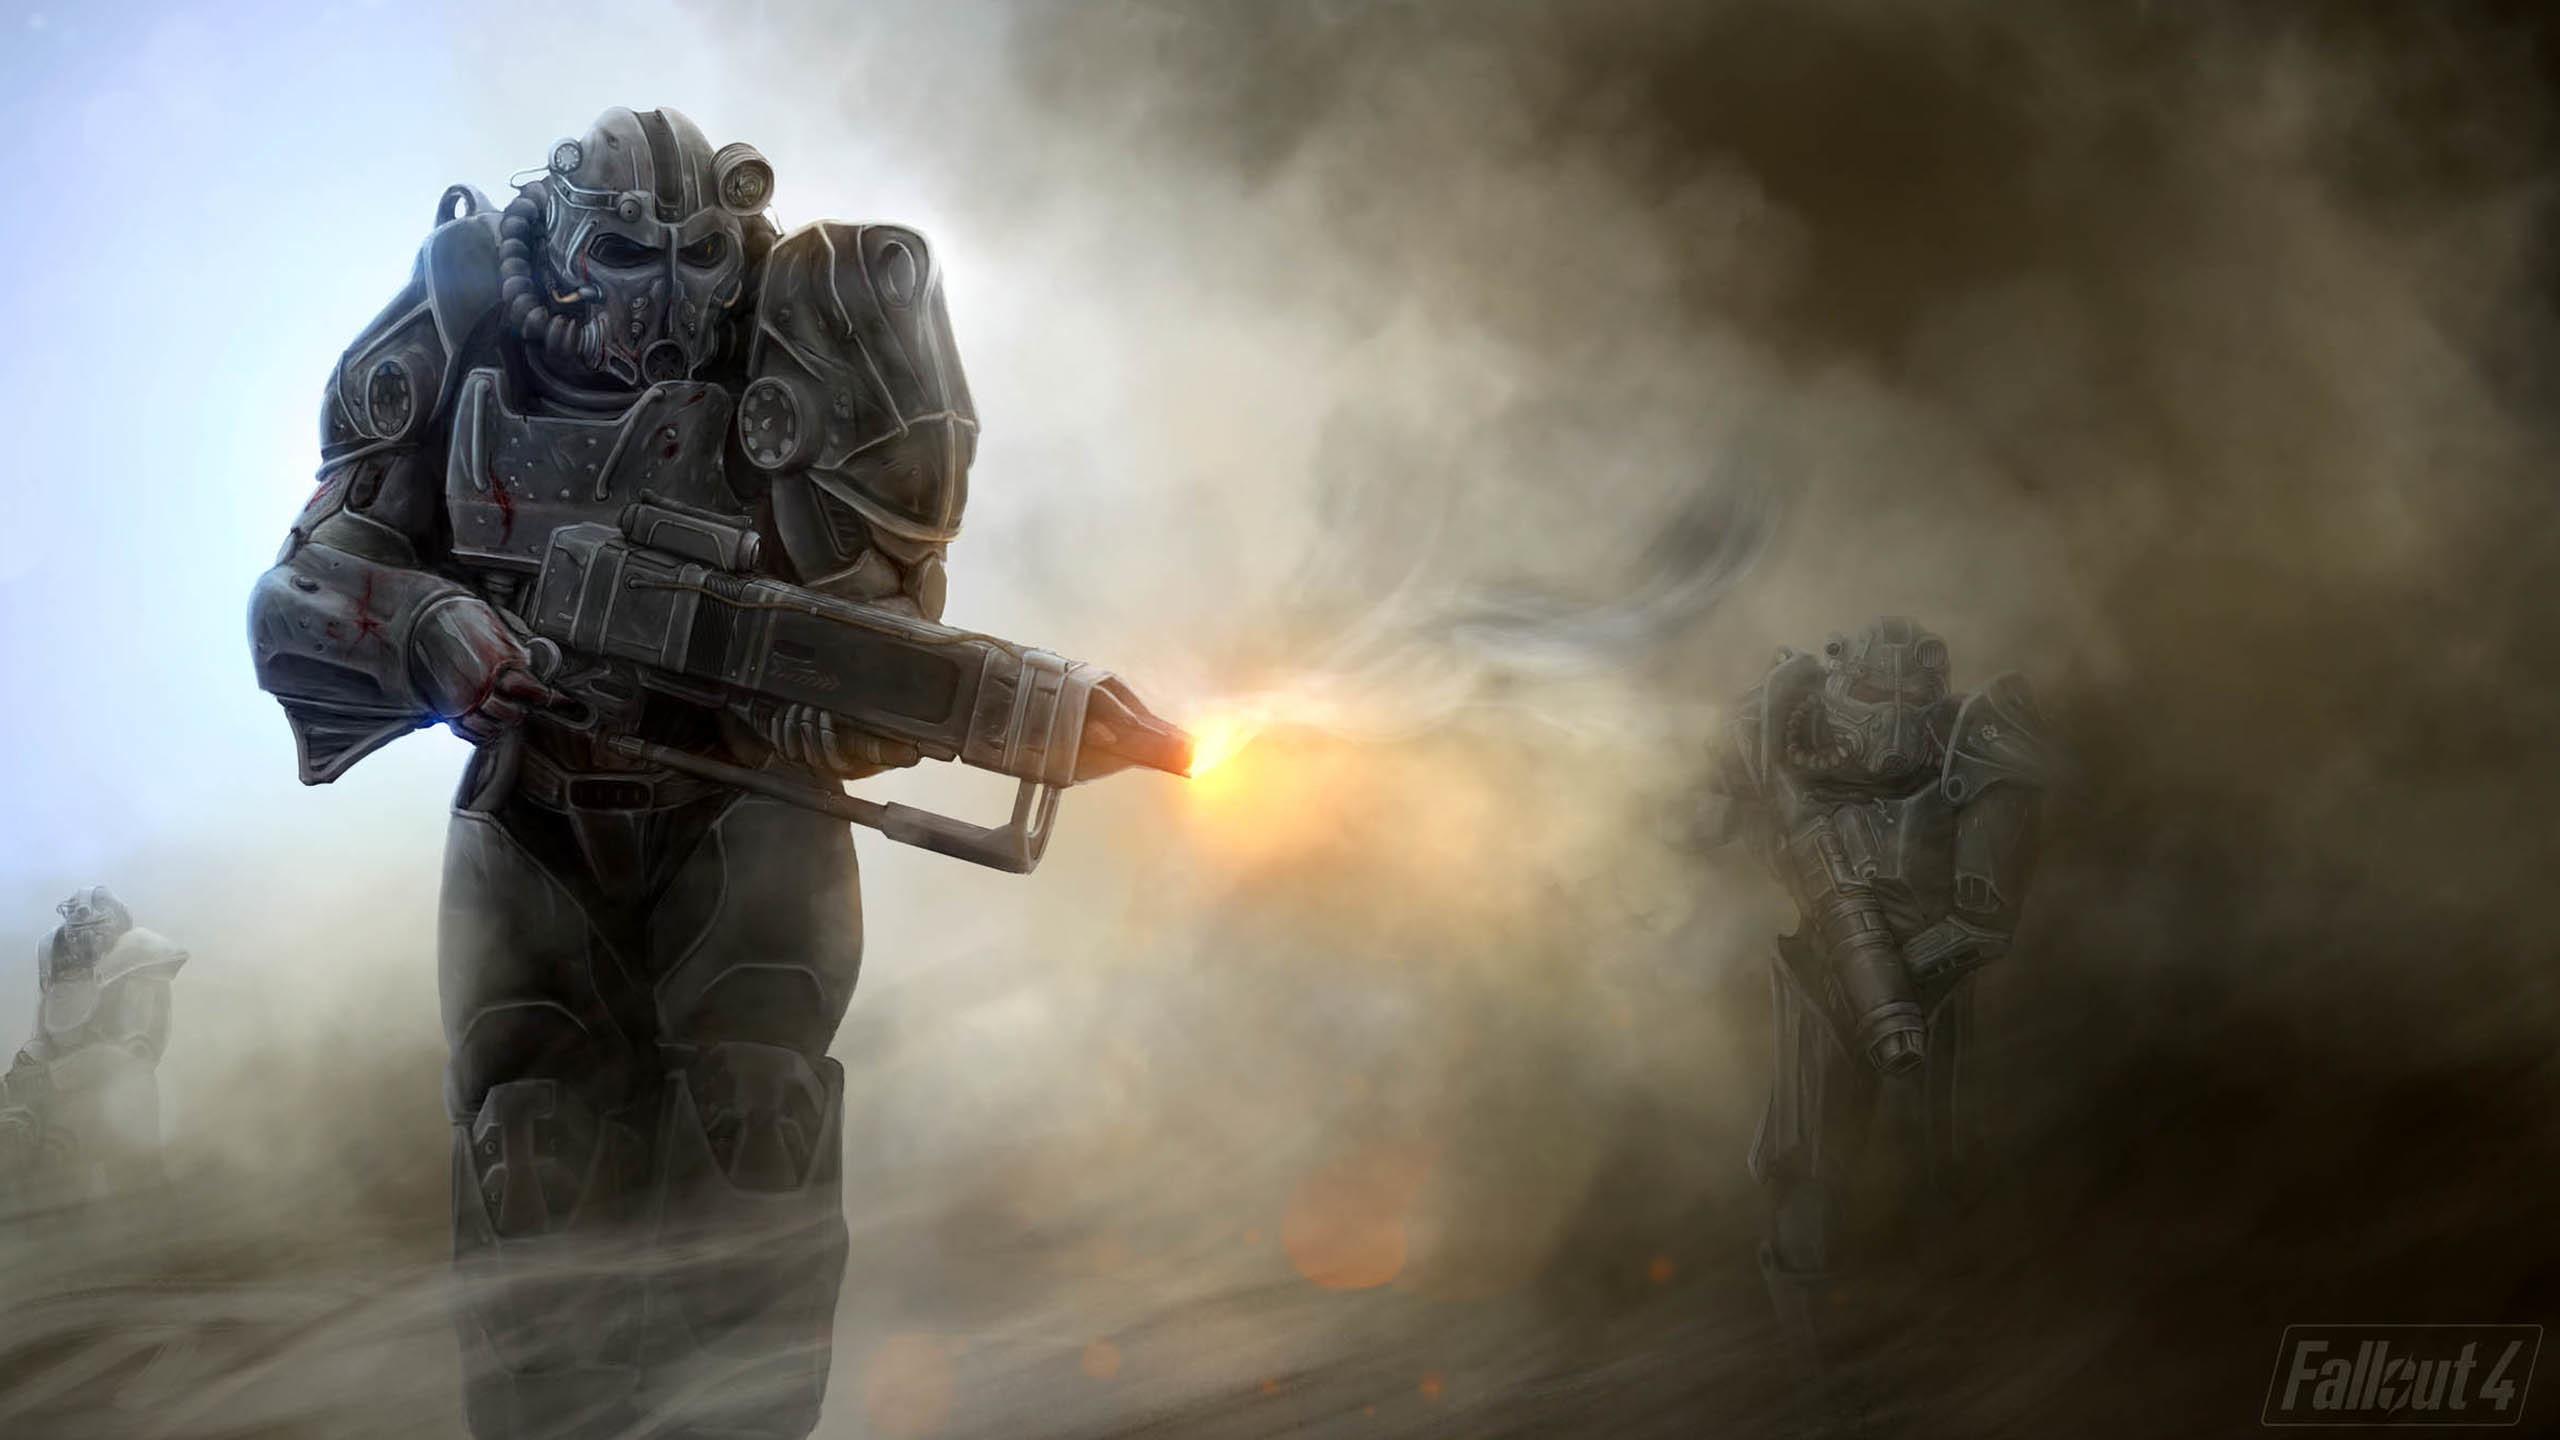 Fallout 4 Concept Art wallpaper